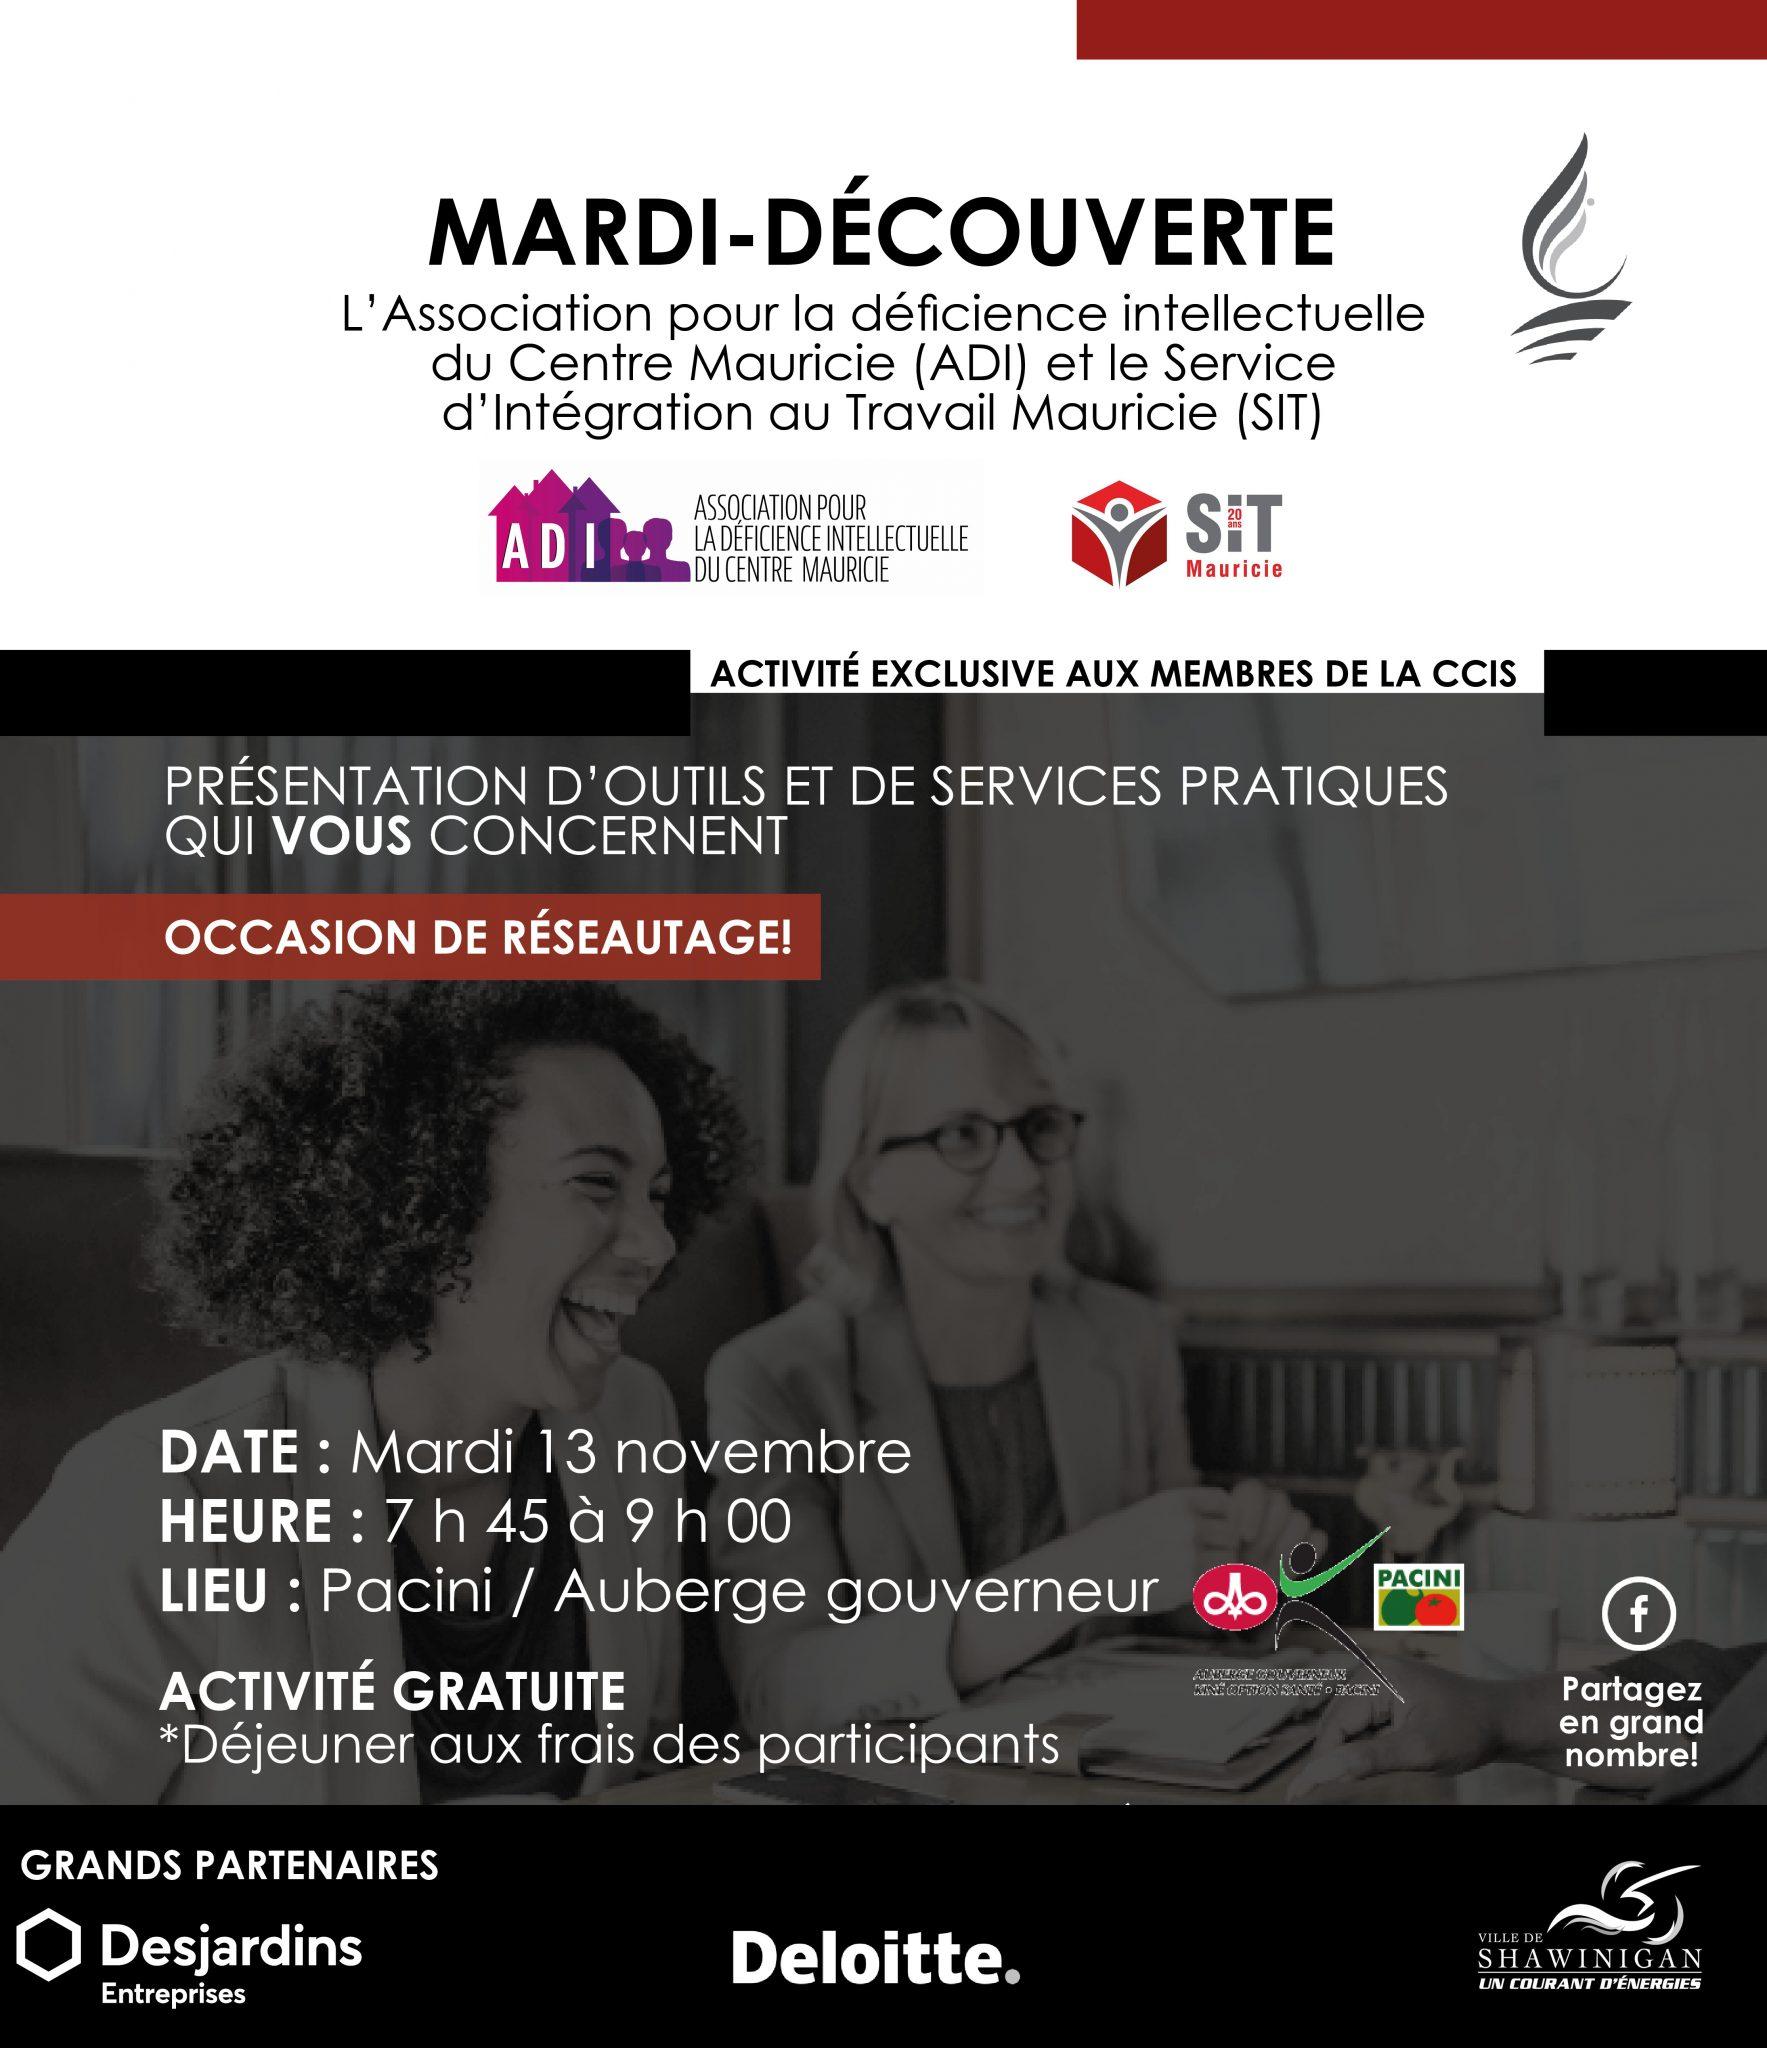 Mardi découverte_ADI (SEMO) SIT update 7nov (002)